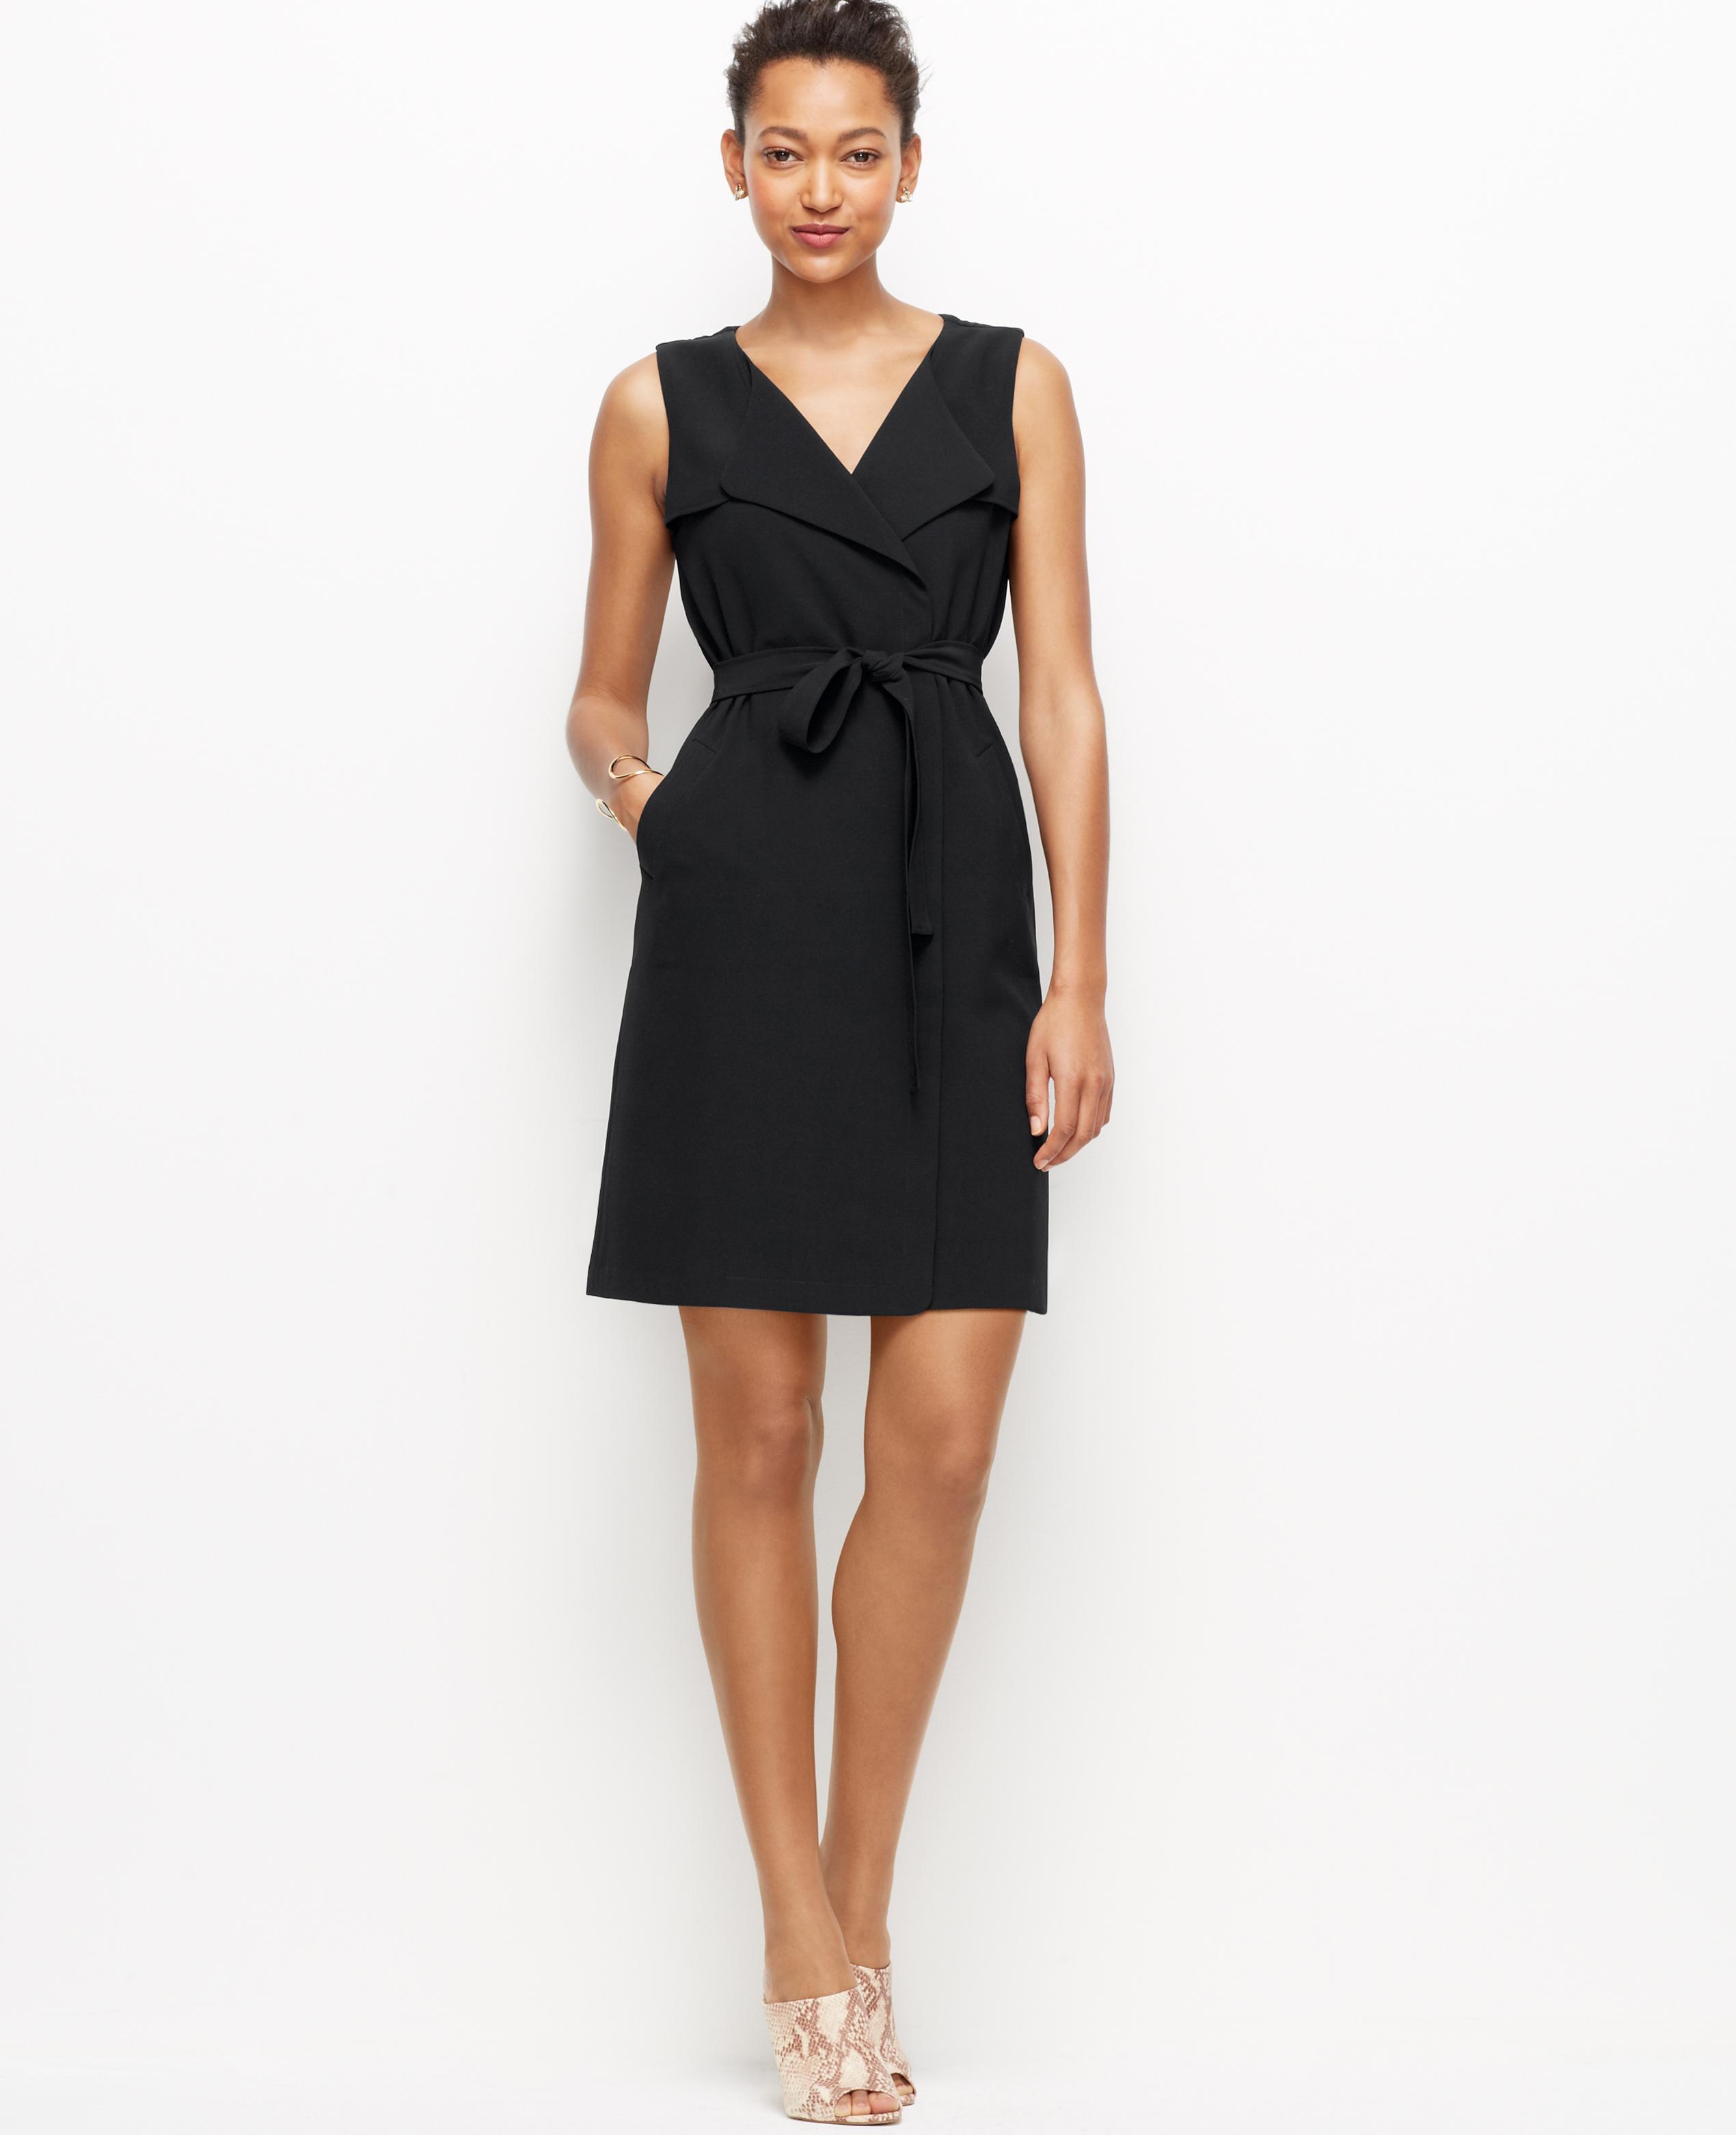 d31d937b3bff Ann Taylor Trench Wrap Dress in Black - Lyst